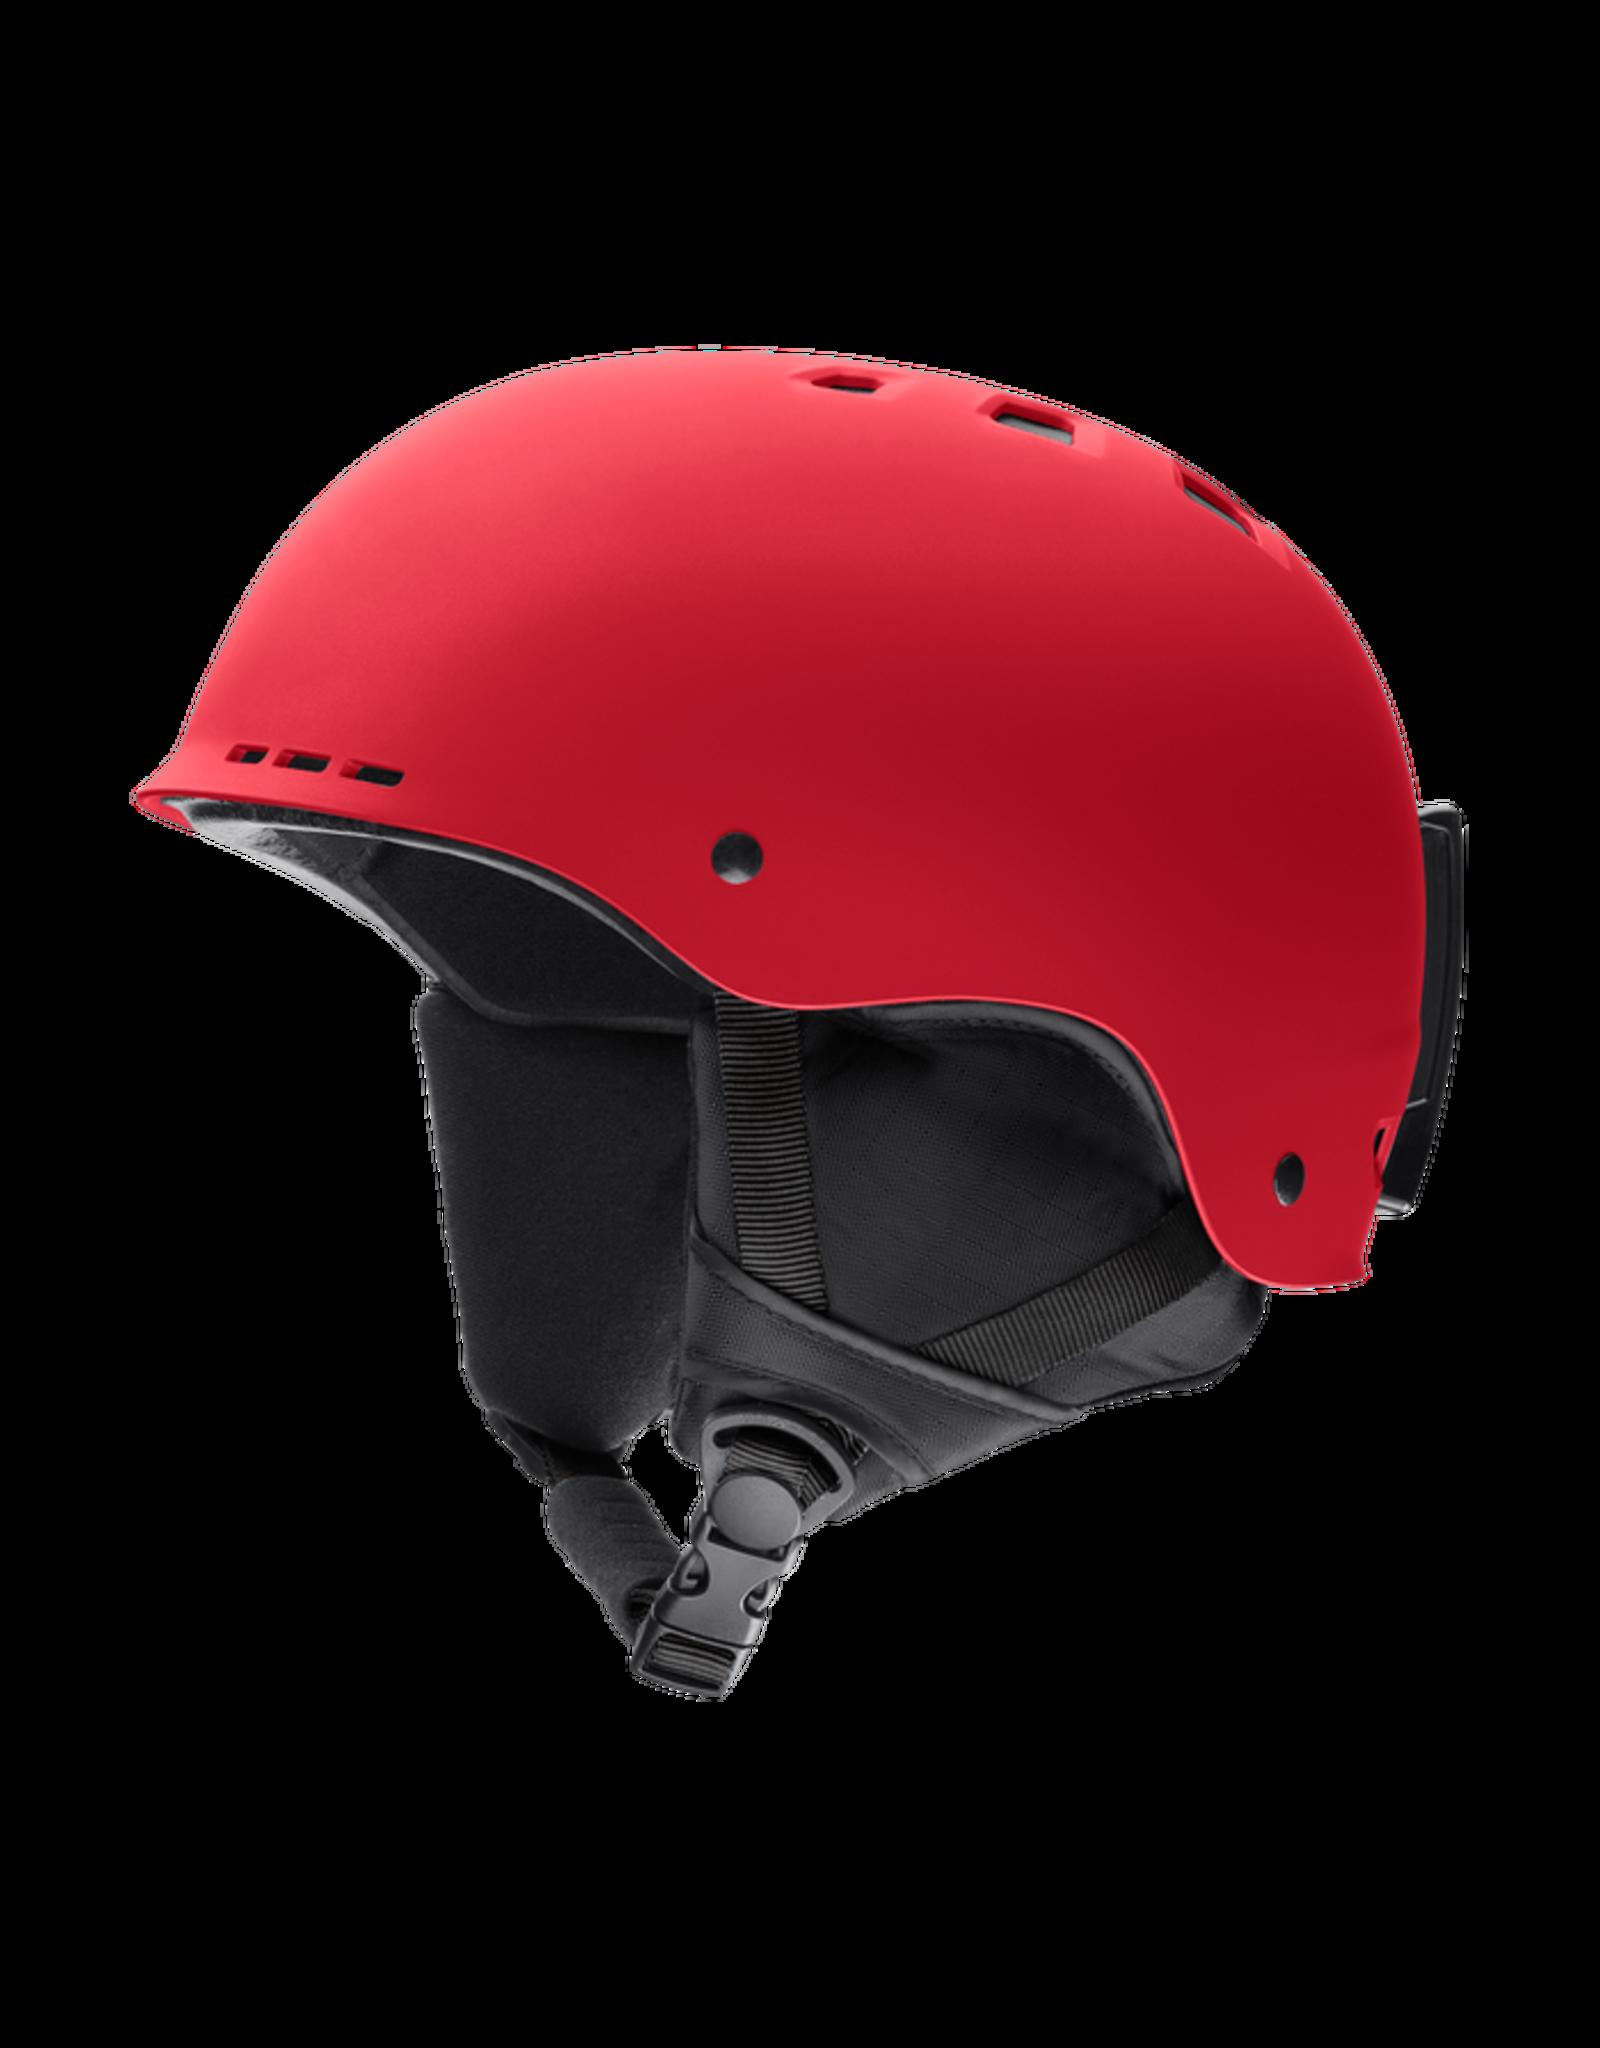 smith optics Smith Holt helmet - Matte Lava - Large 59-63cm